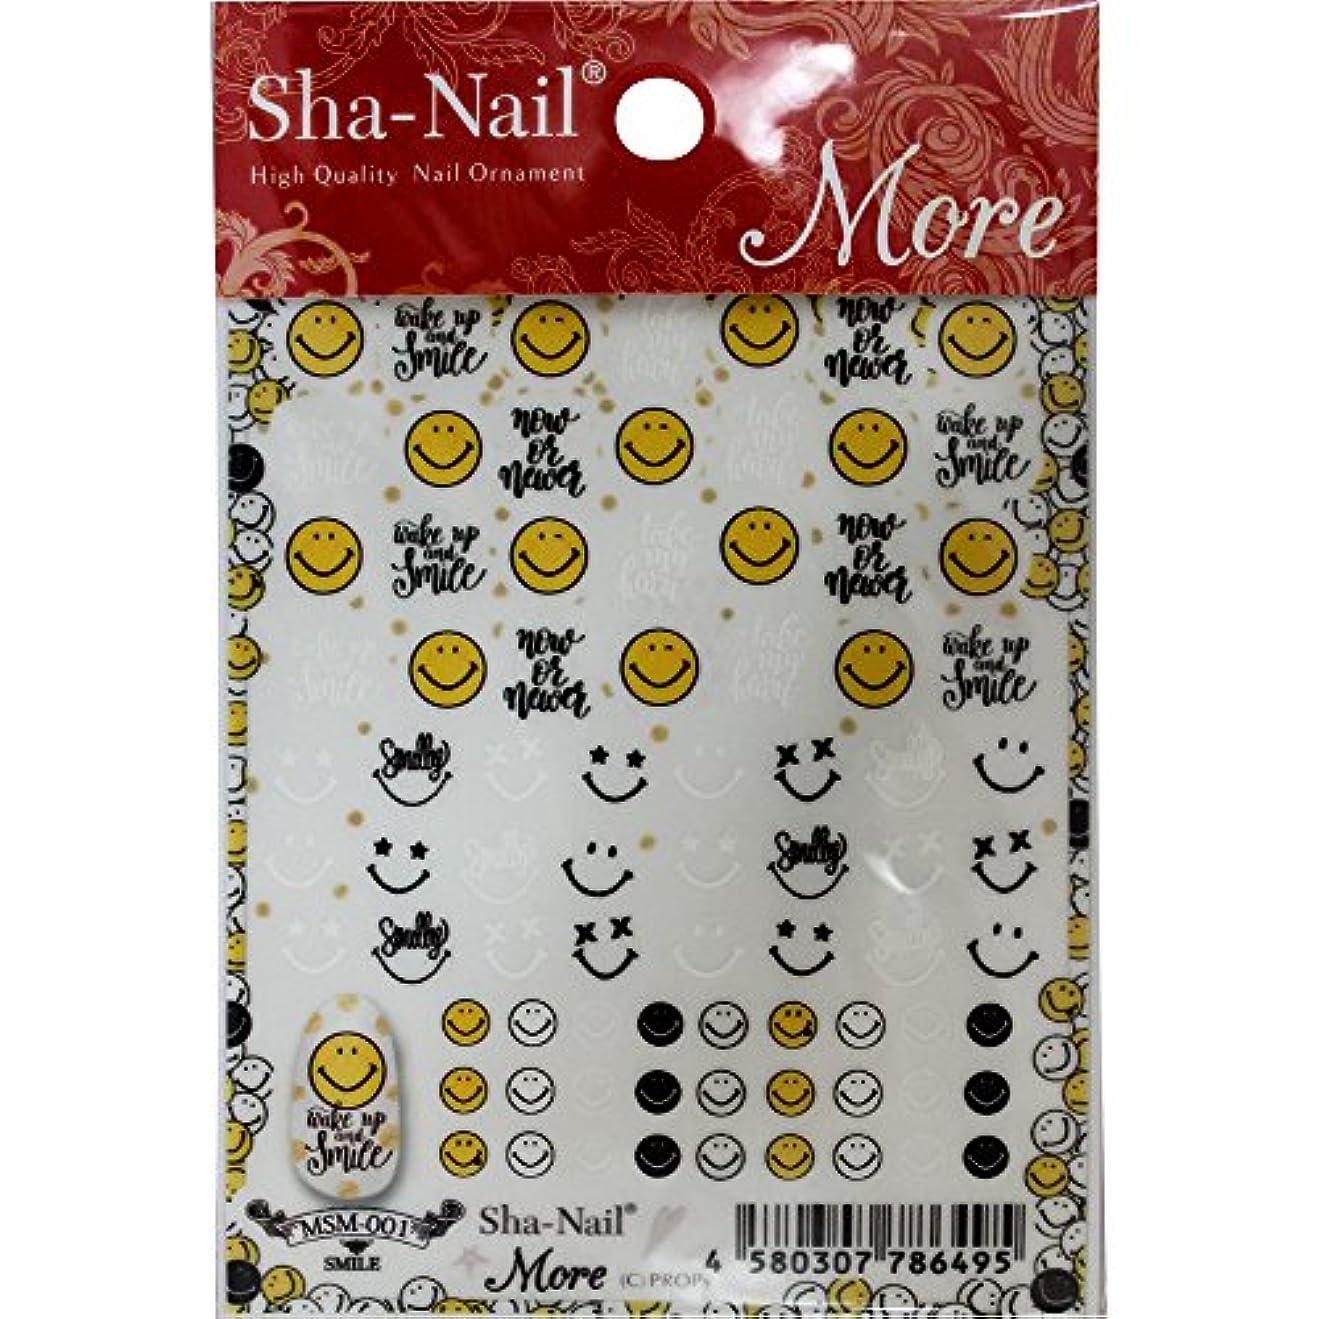 Sha-Nail More ネイルシール スマイル MSM-001